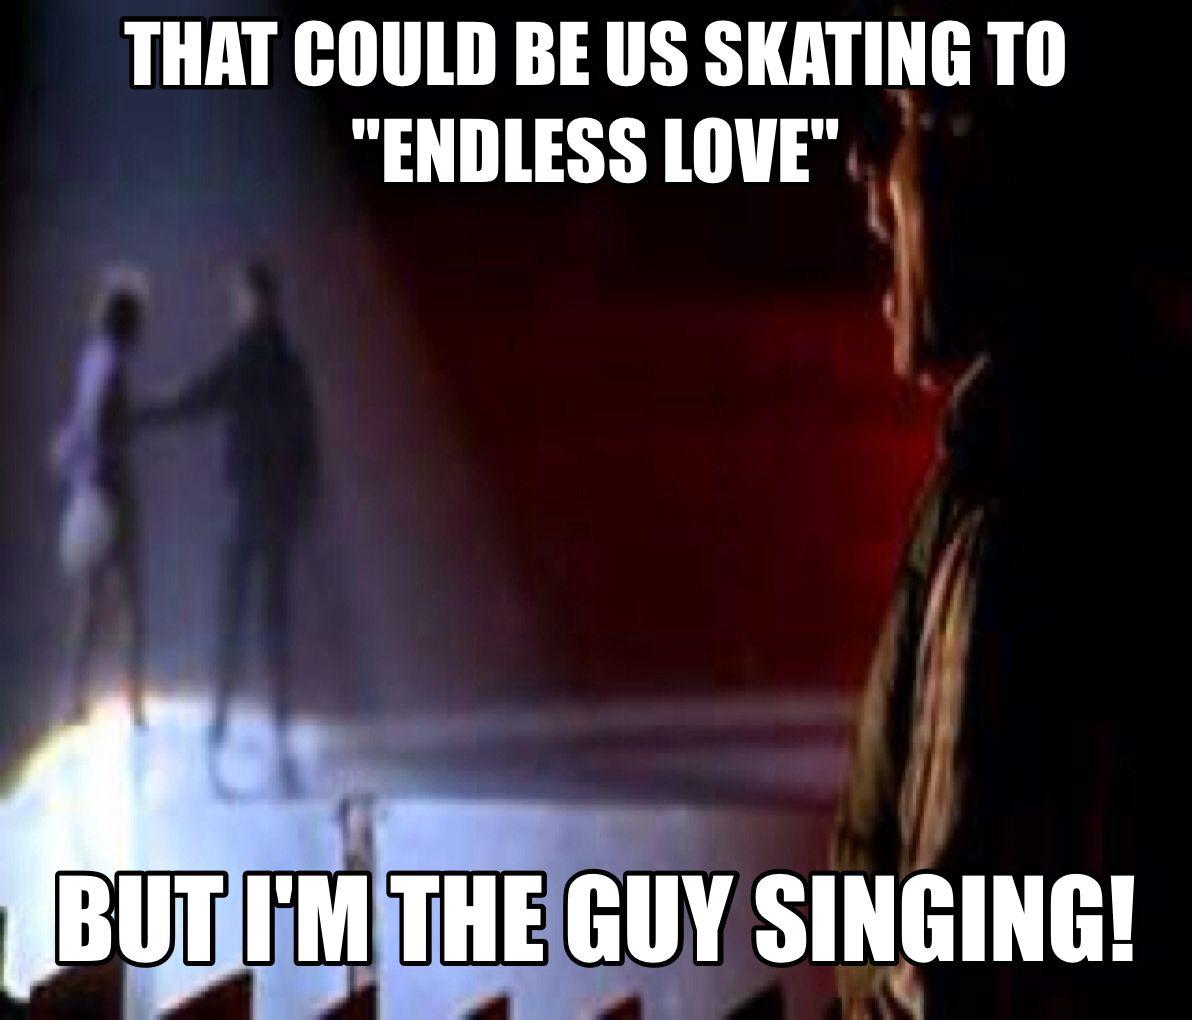 Friends Can Listen To Endless Love In The Dark Adam Sandler Happy Gilmore Thatcouldbeus Thiscouldbeus Adam Sandler Jokes Endless Love